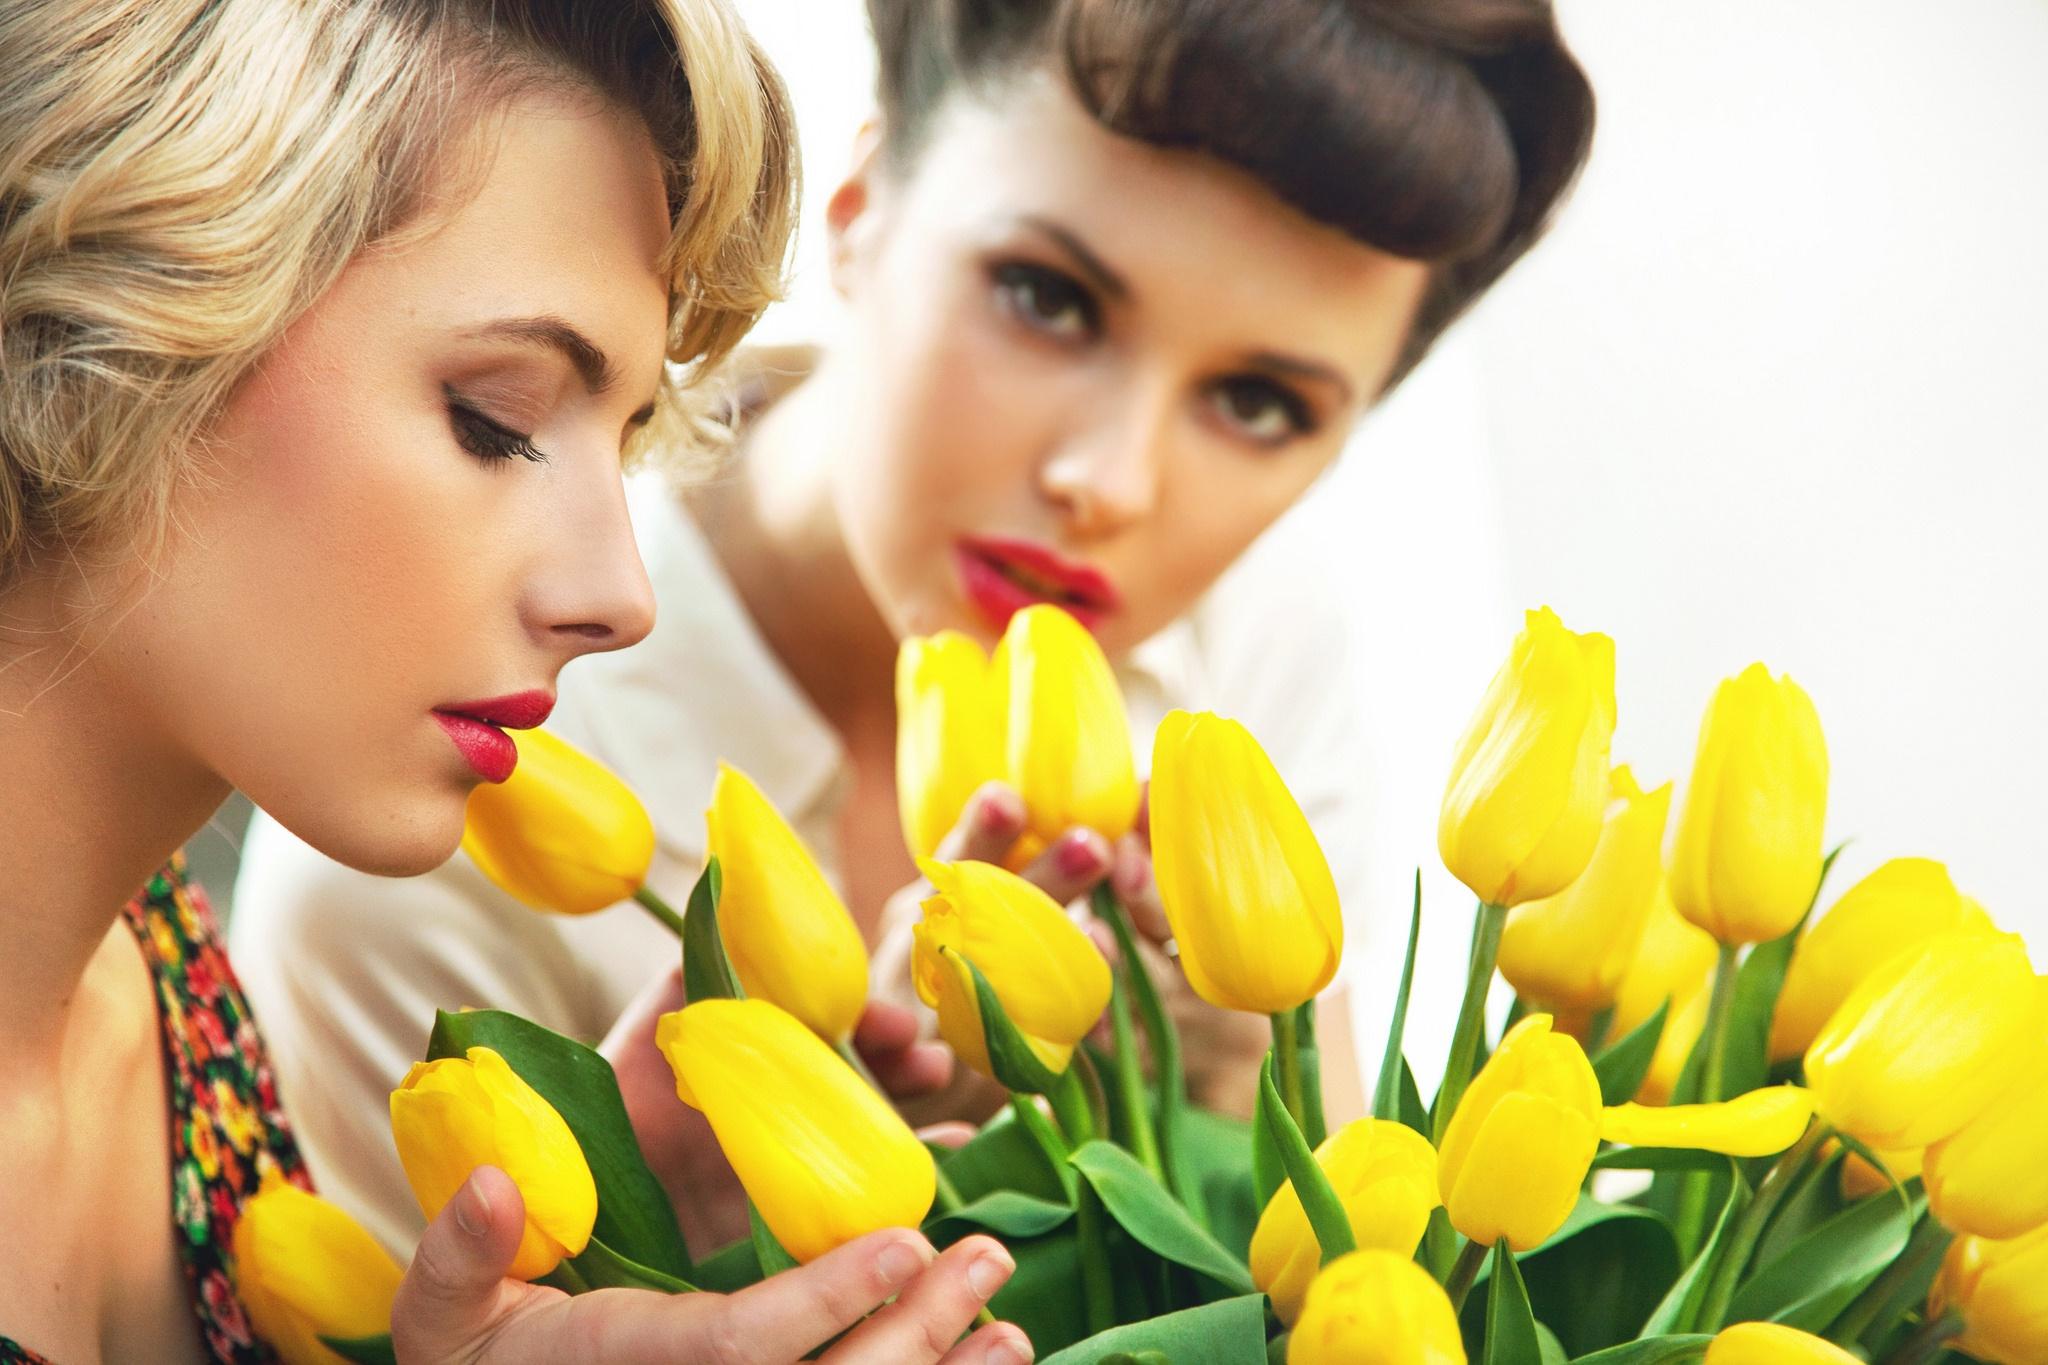 Фото две девушки с цветами